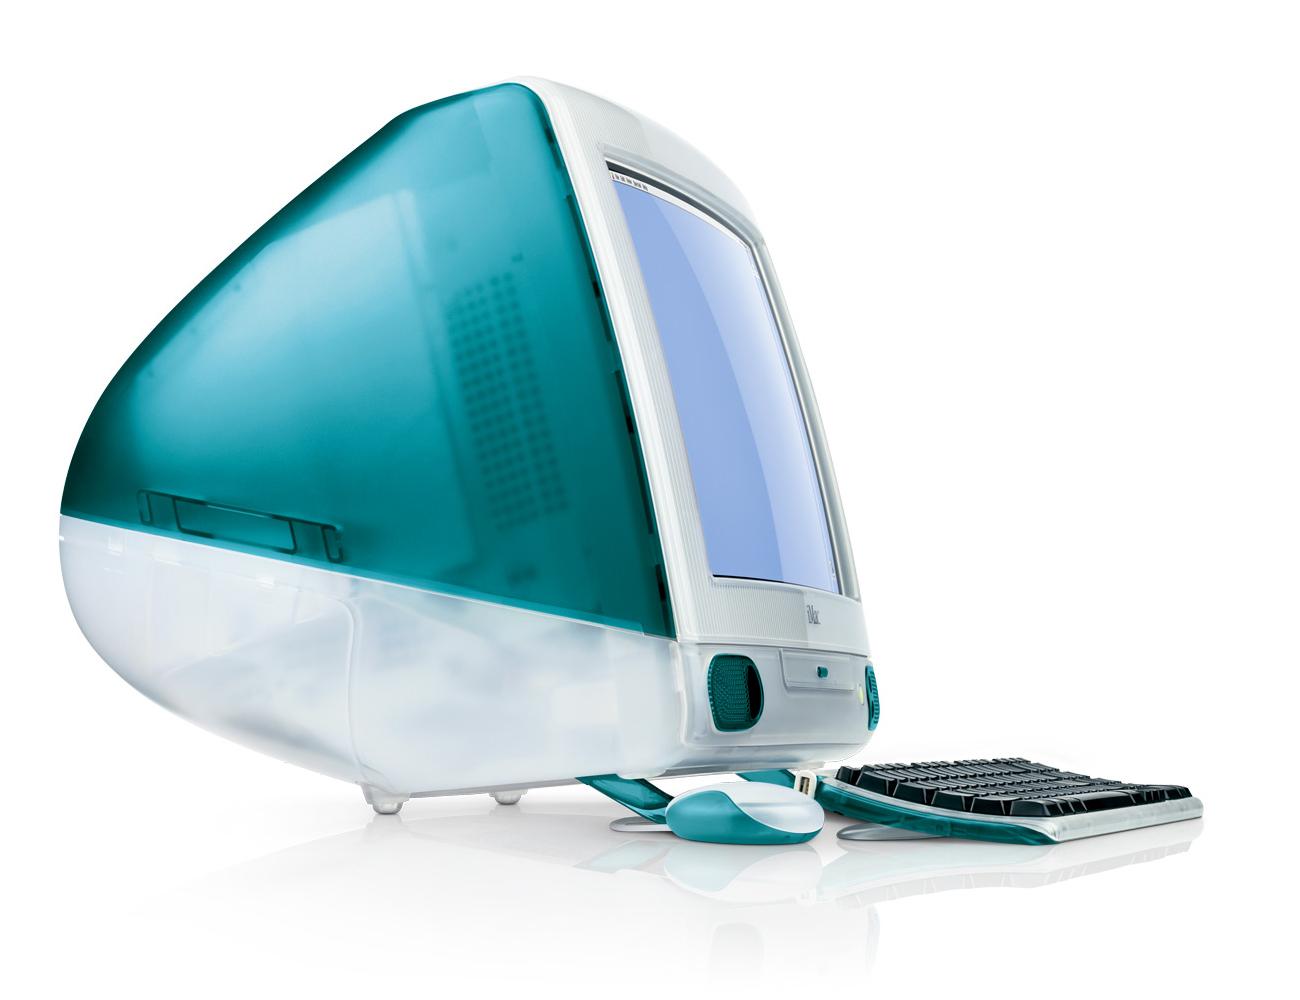 19980815_iMac